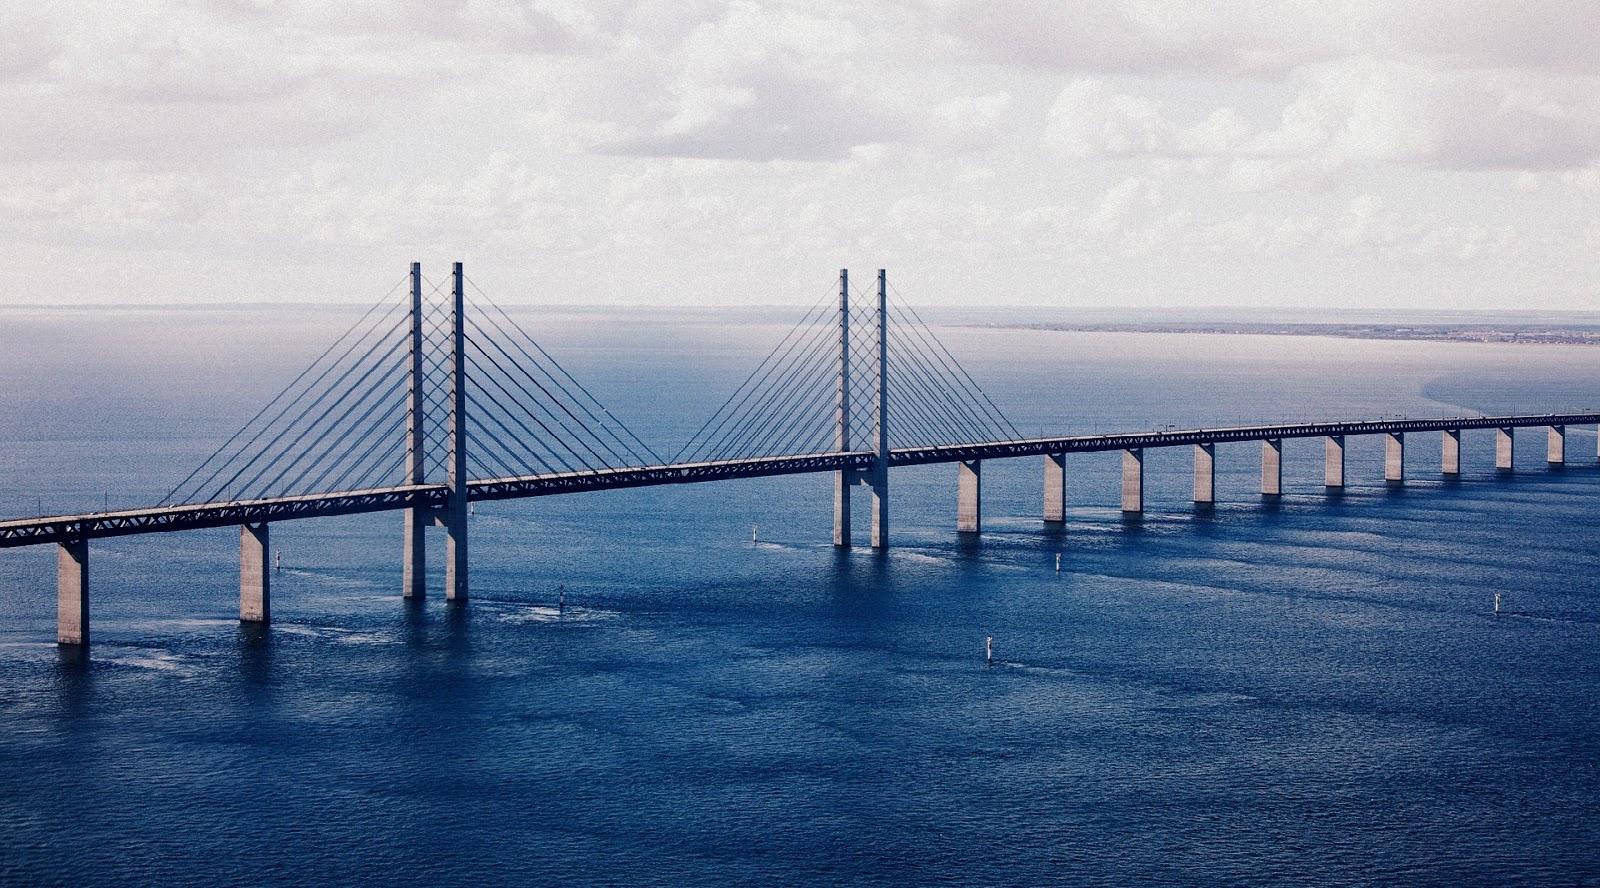 The Oresund Bridge panorama view